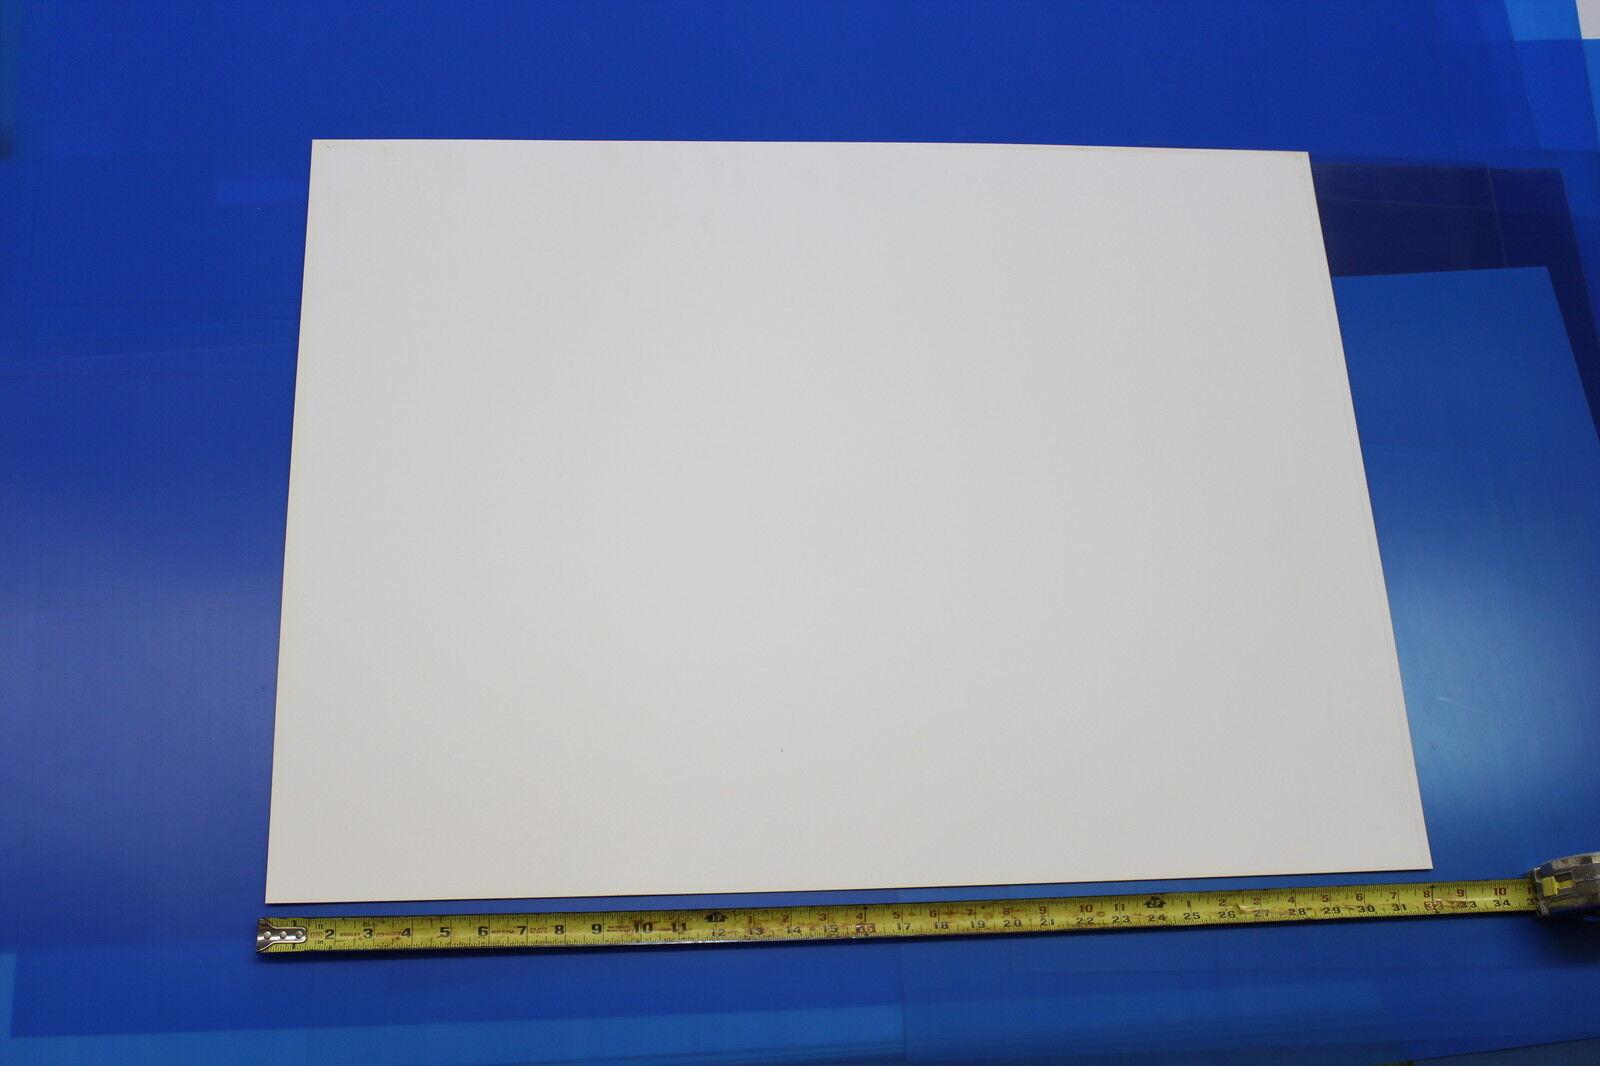 "PETG CLEAR PLASTIC SHEET 0.030/"" X 24/"" X 48/"" VACUUM FORMING RC BODY HOBBY"